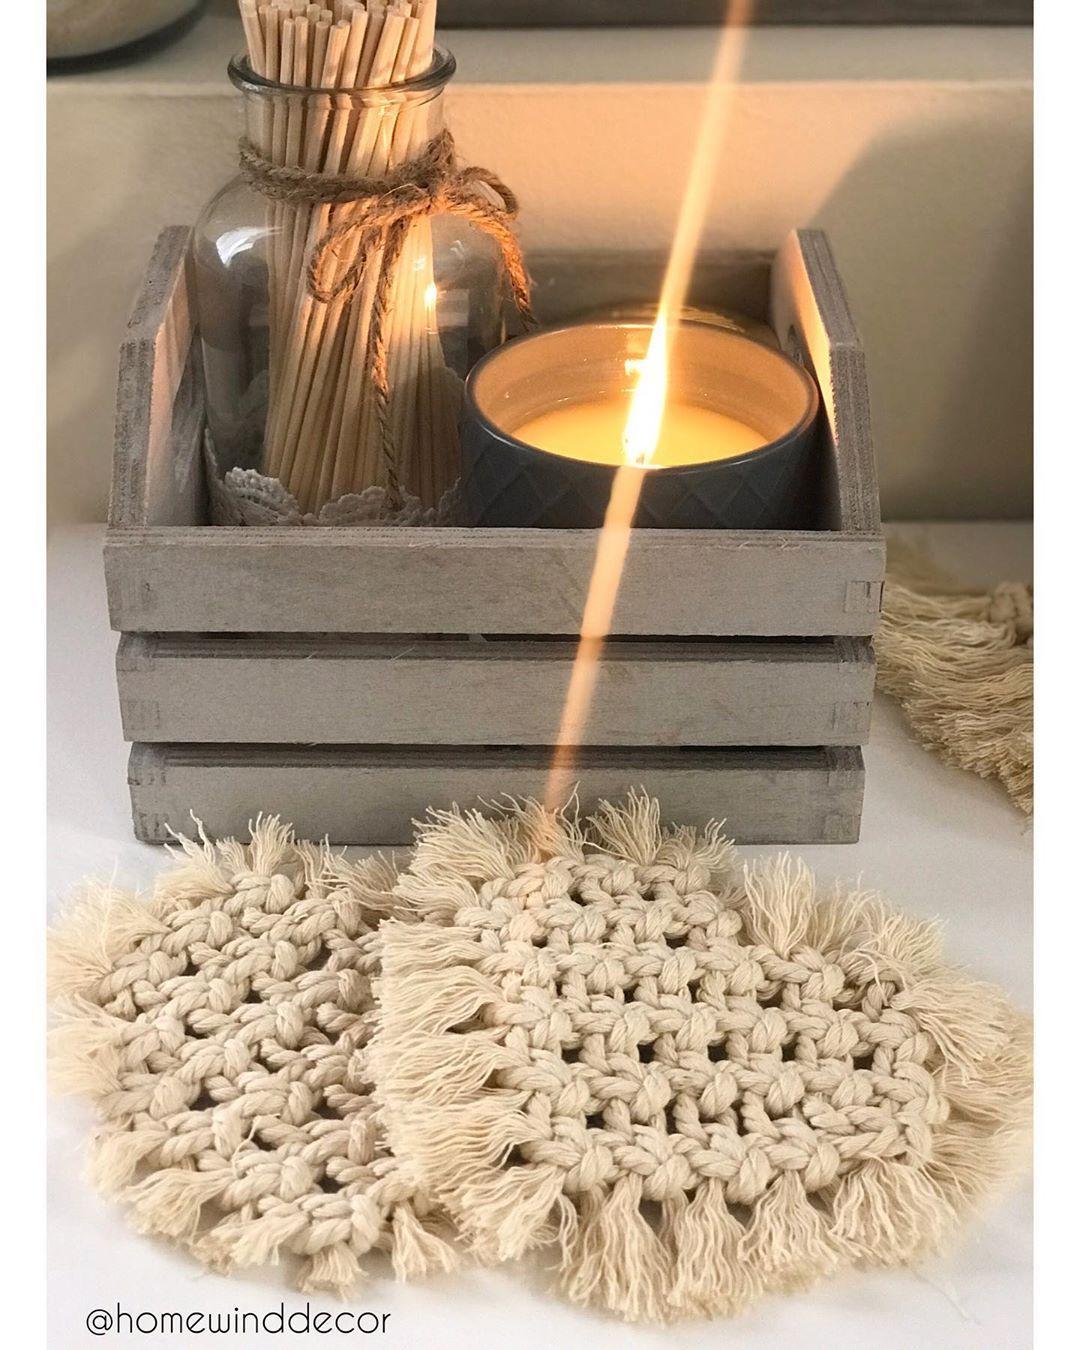 "Handmade Décor on Instagram: ""Candles & heart mug rugs are a whole vibe ✨ • • • #handmadehomedecor #homedecor #home #heart #heartmugrugs #heartrugs #heartcoasters…"""